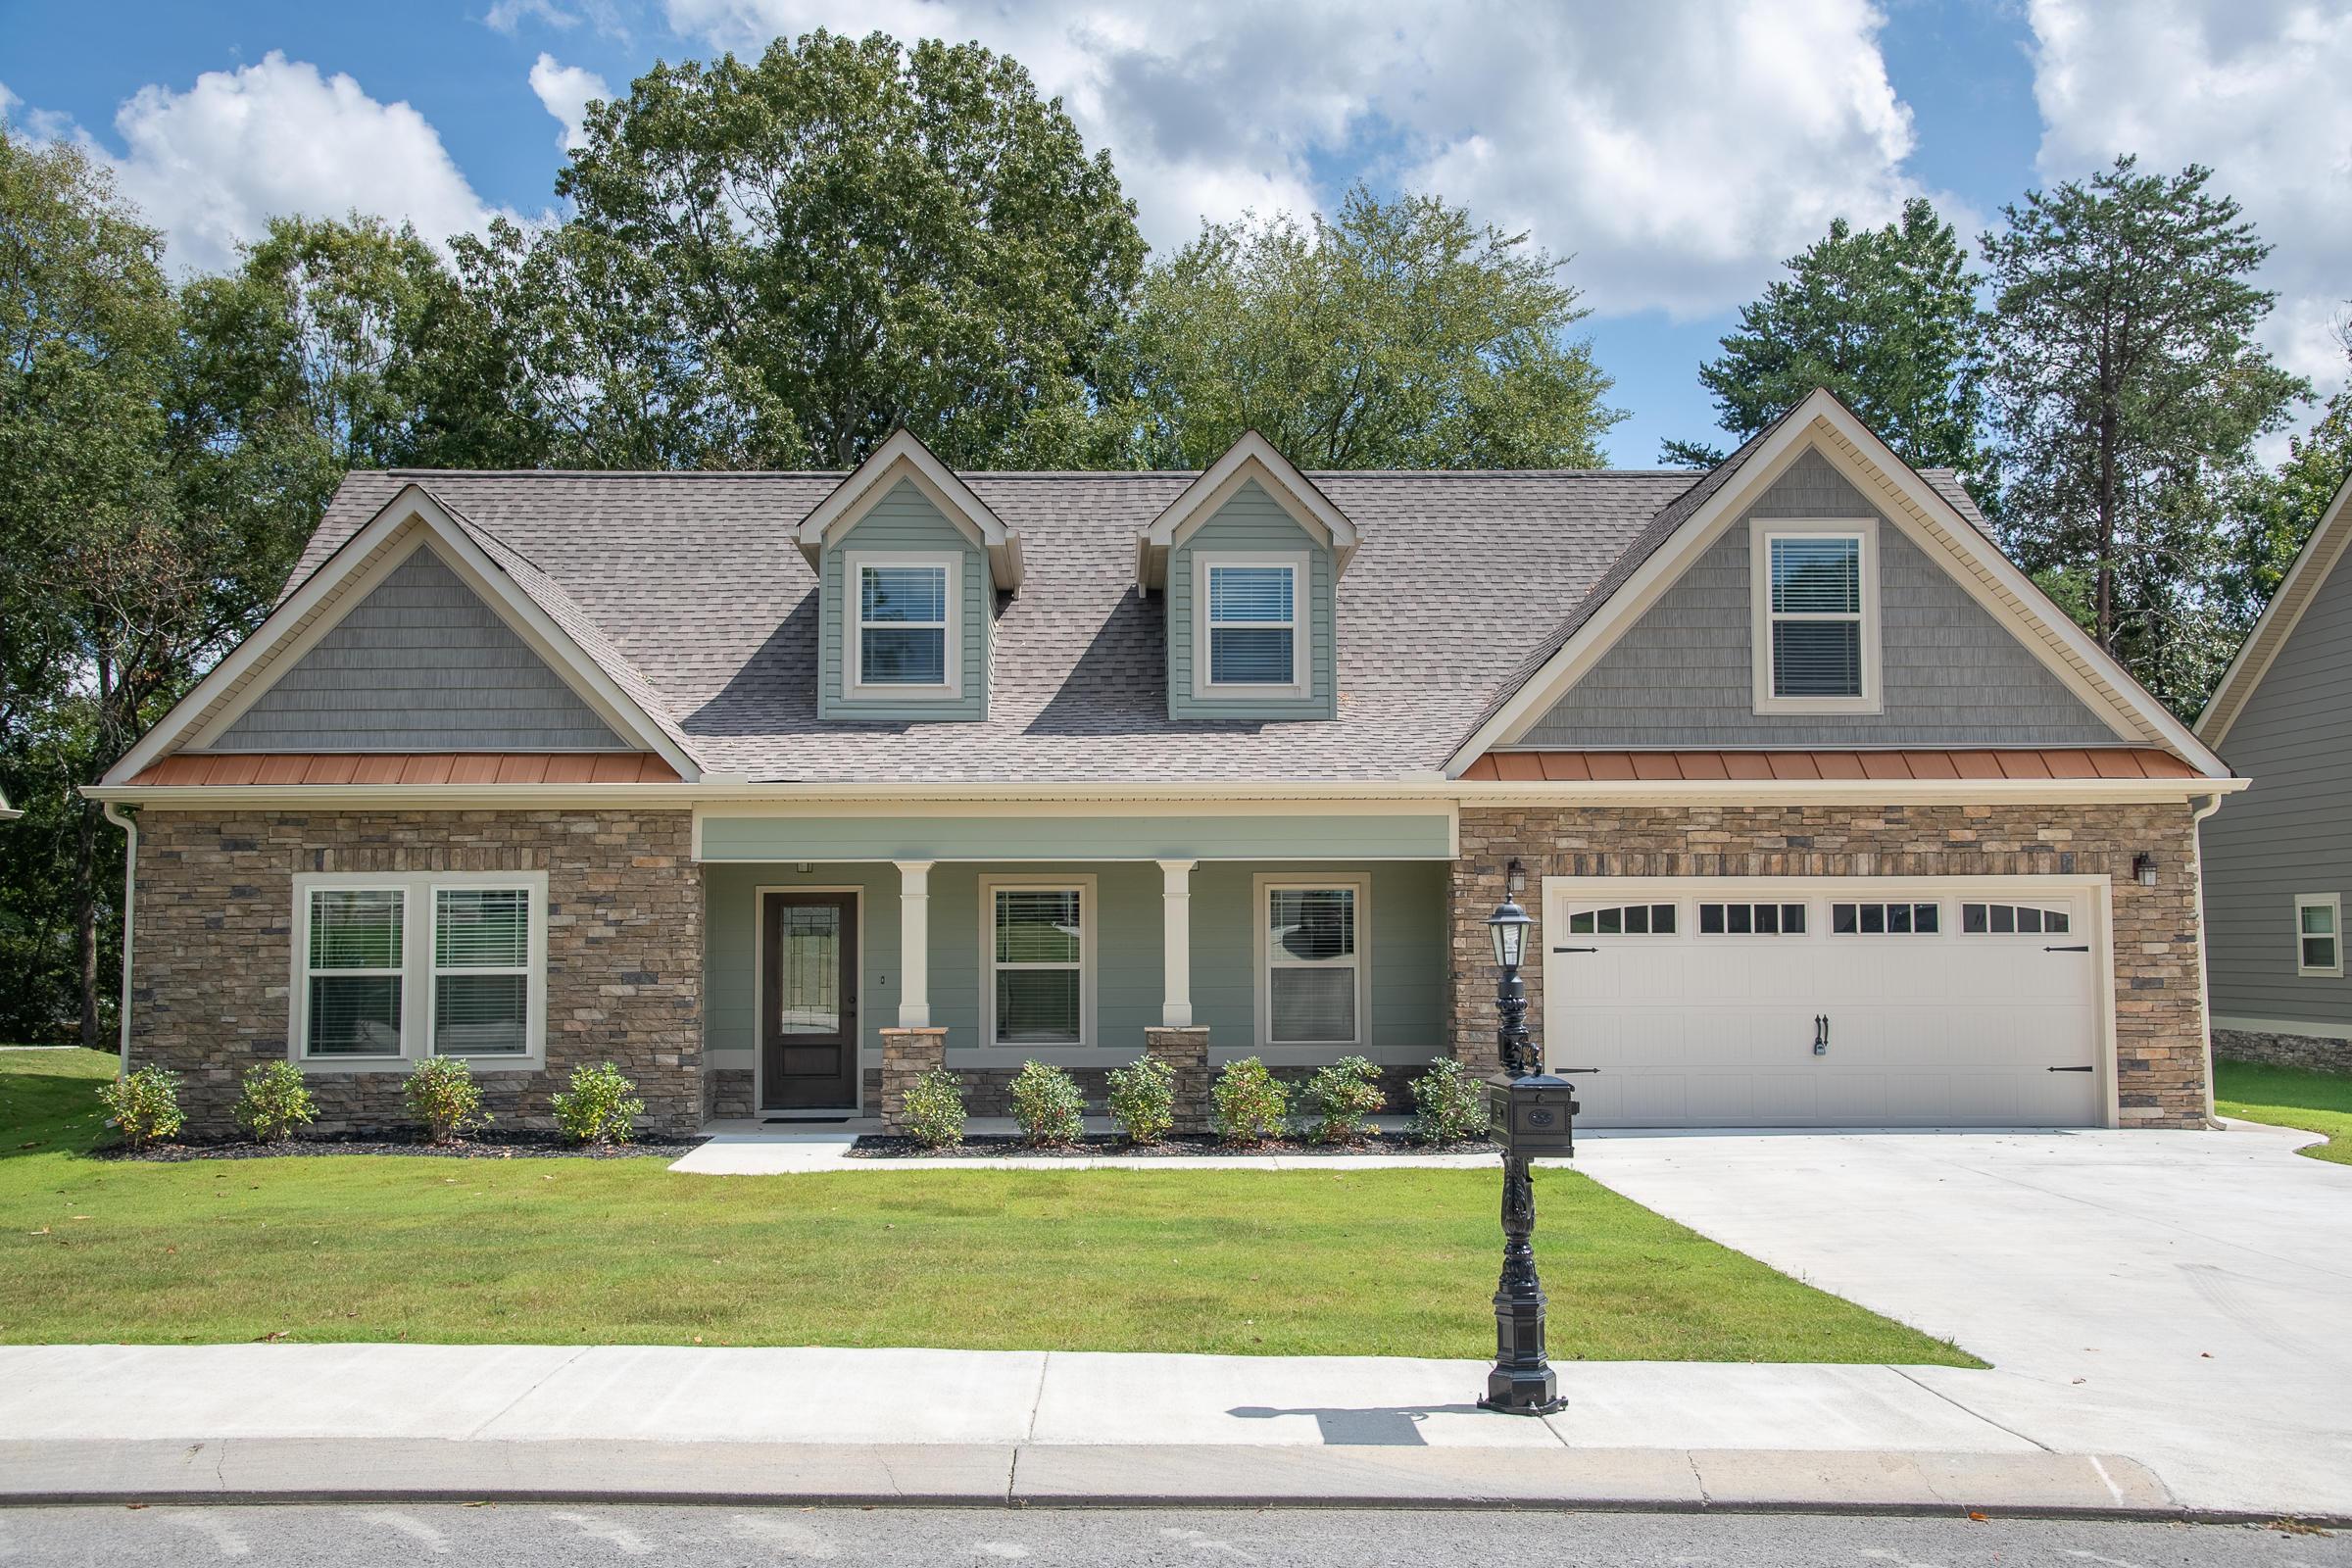 625 Live Oak Rd, Ringgold, GA 30736